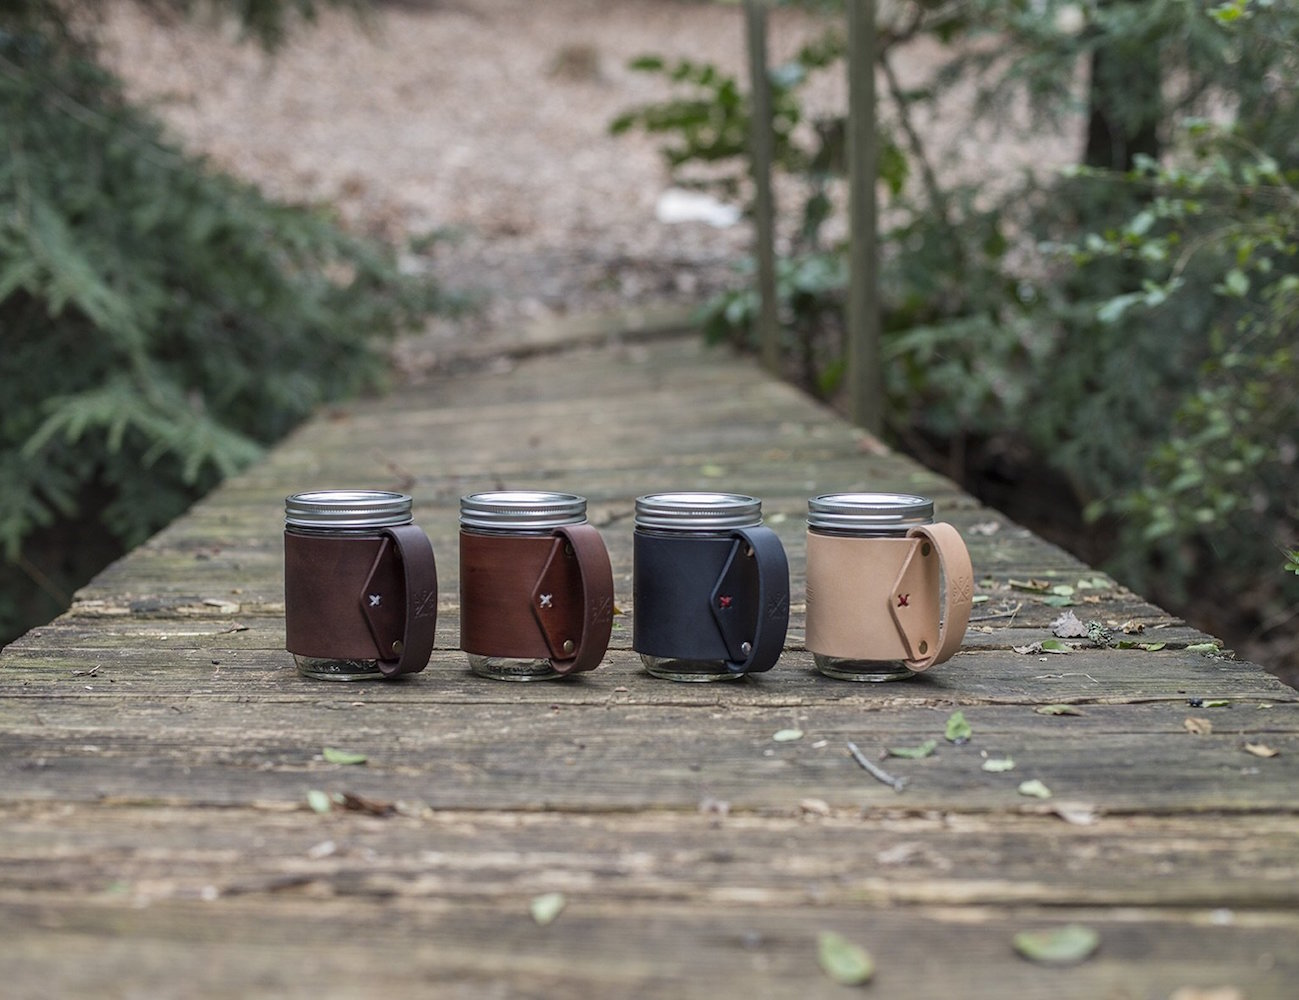 the-traveler-mug-mason-jar-hugged-in-vegetable-tanned-leather-02